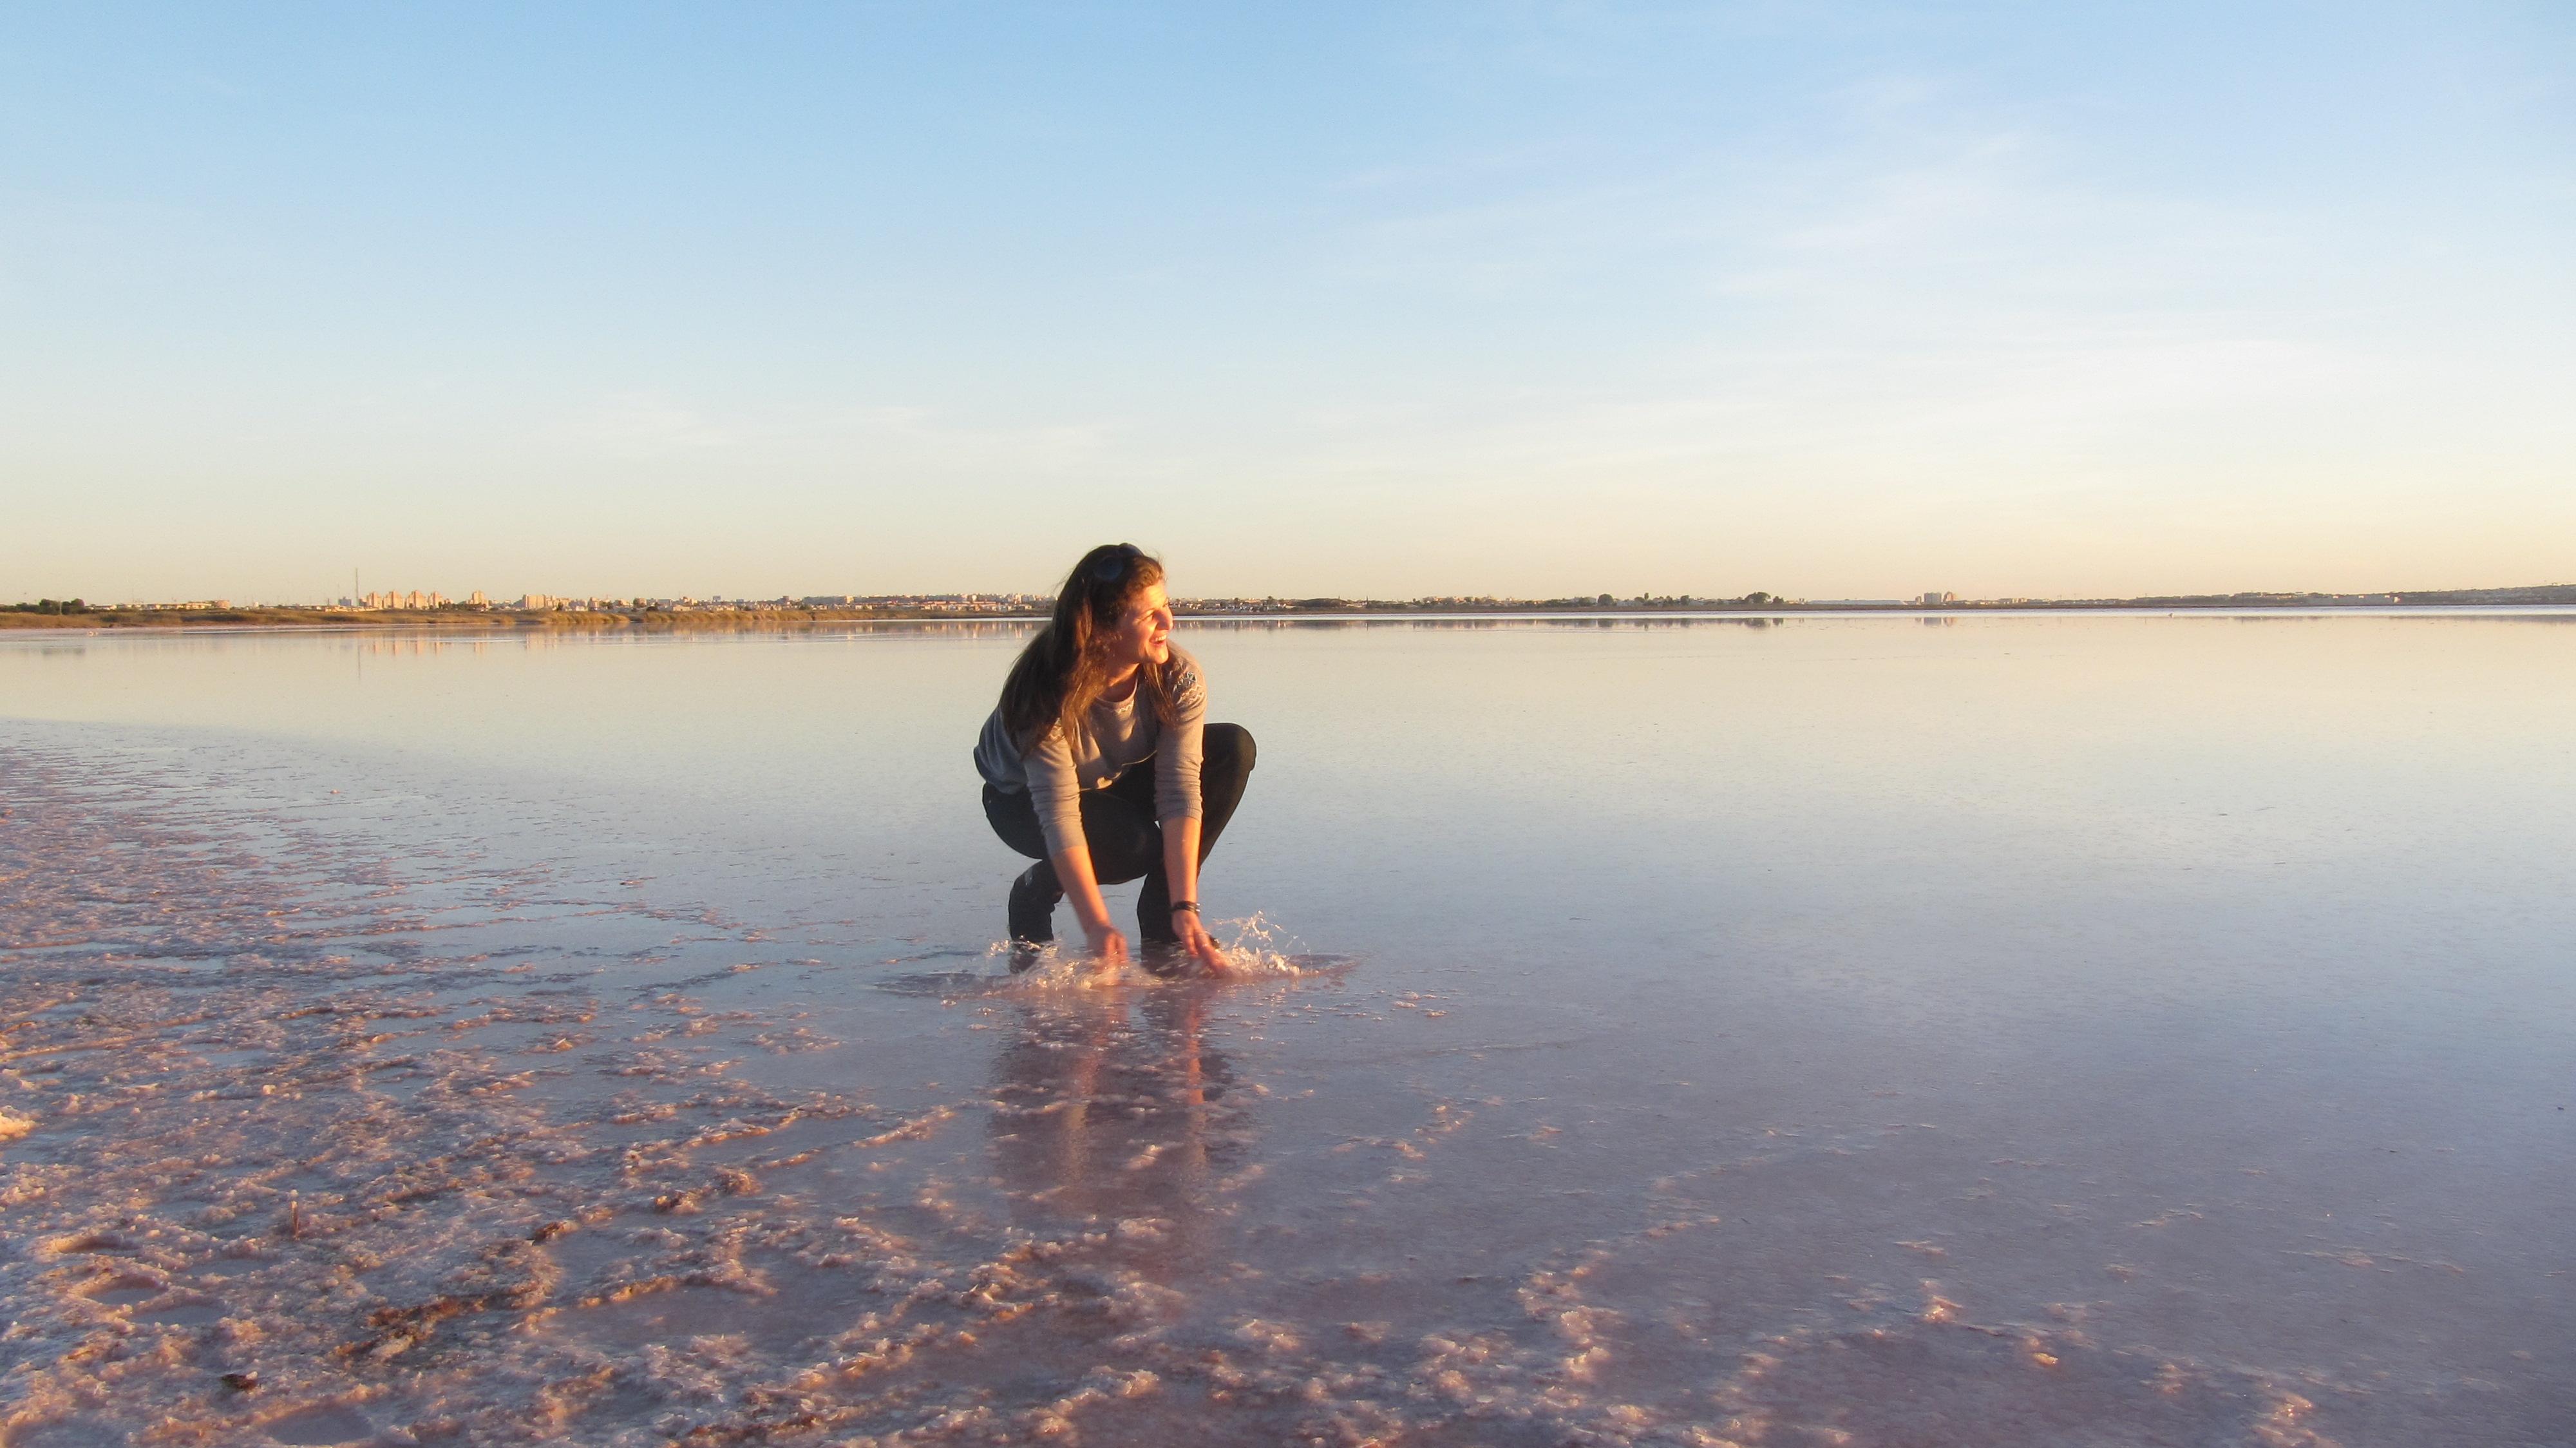 Laguna rosa torrevieja, agua, atardecer, pixabay, españa, agorastyle